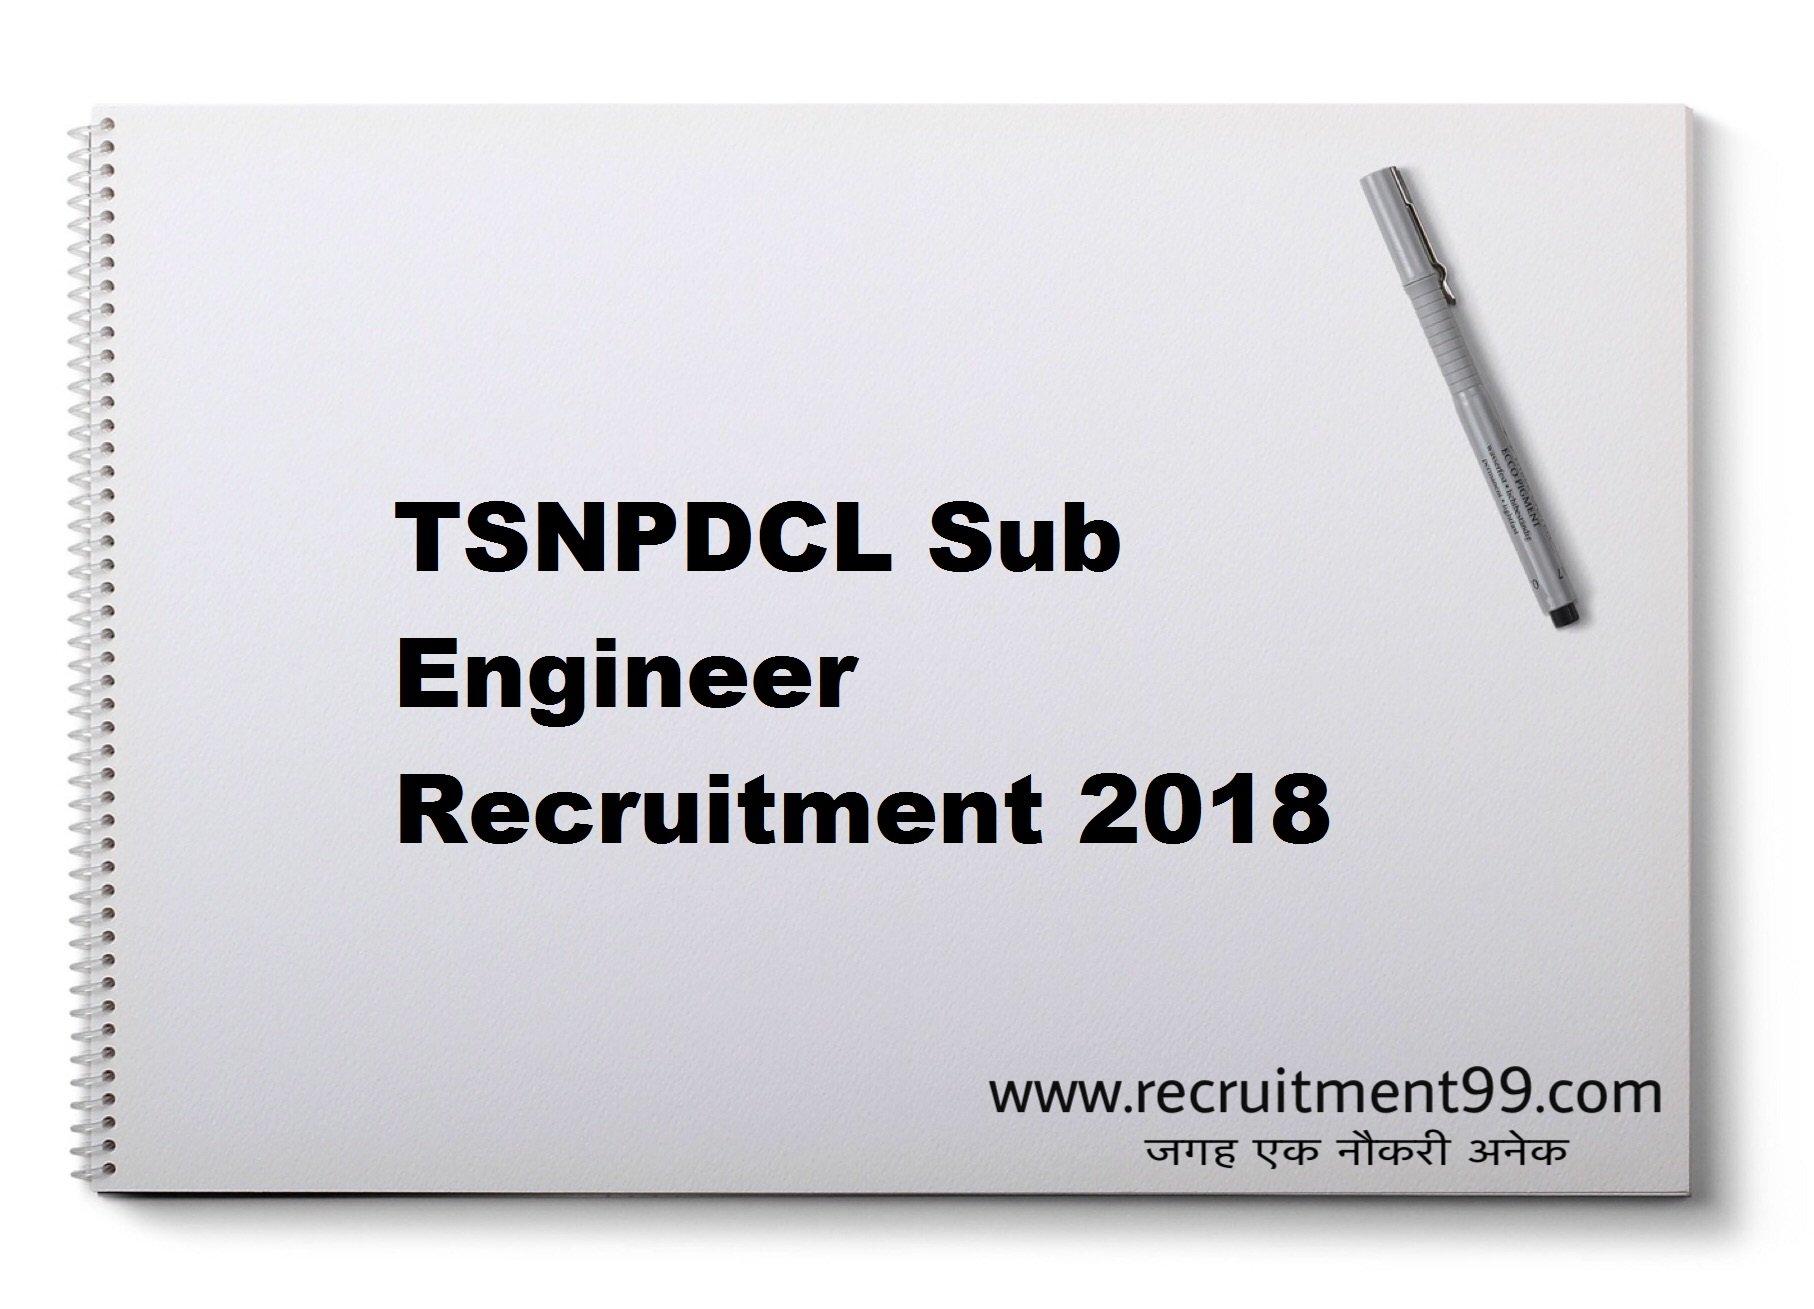 TSNPDCL Sub Engineer Recruitment Hall Ticket Result 2018